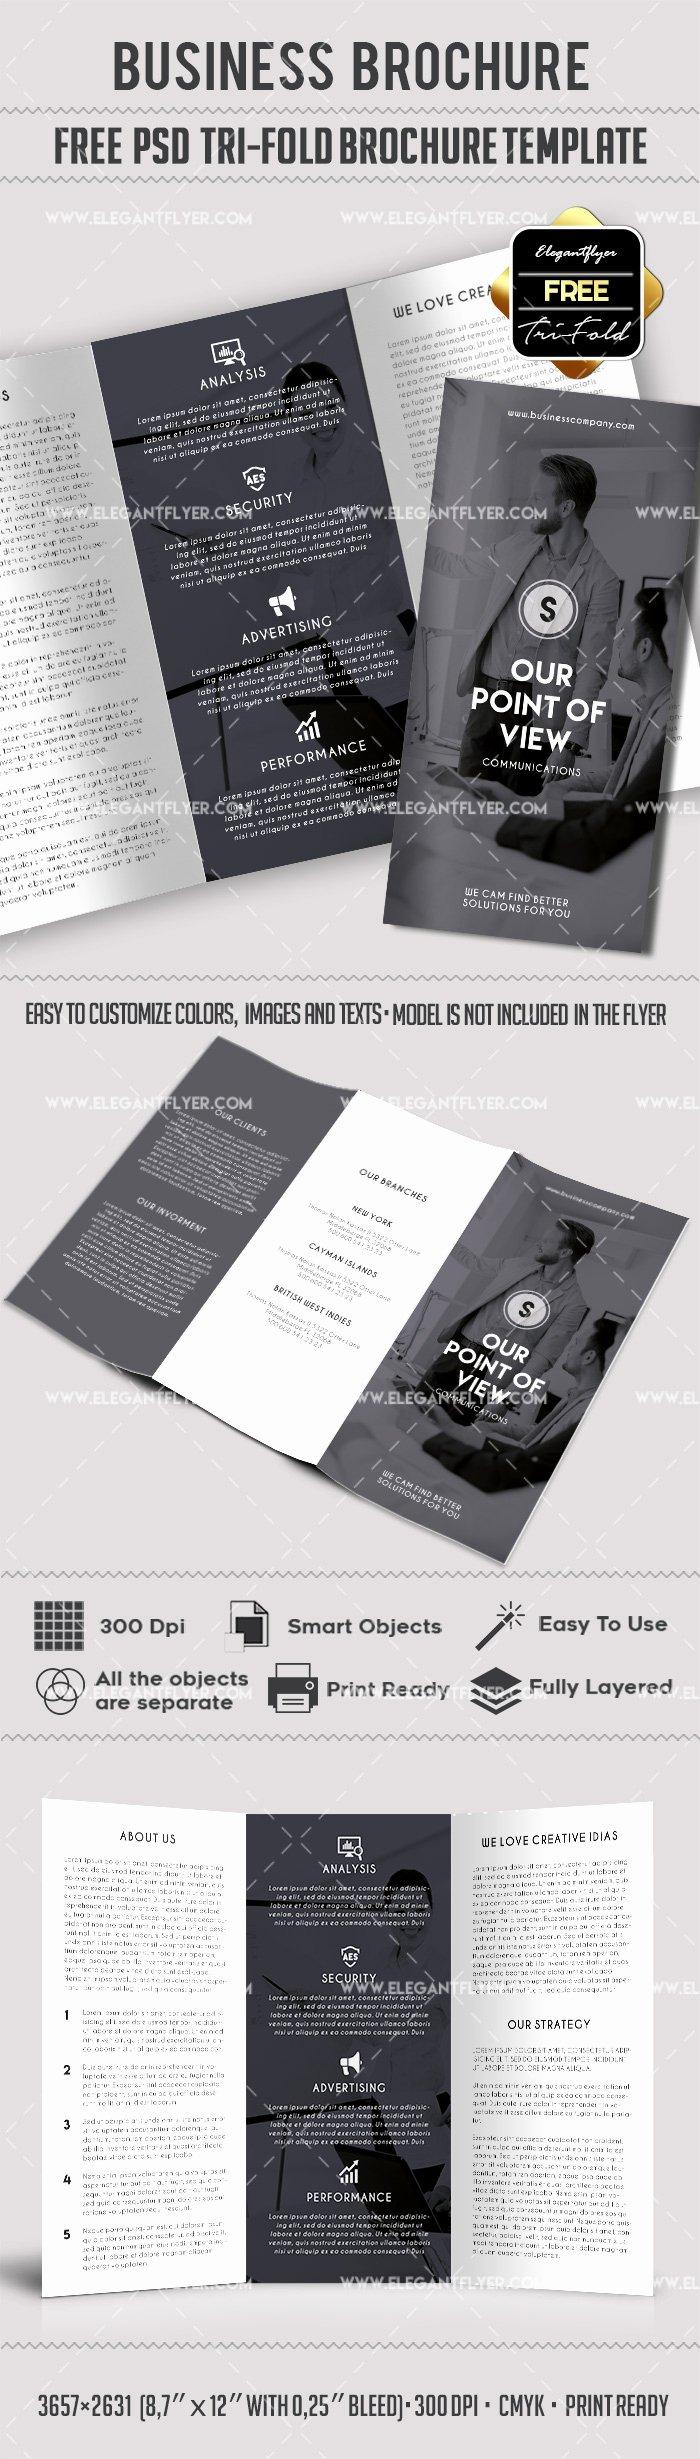 Tri Fold Brochure Template Psd Beautiful Business – Free Psd Tri Fold Psd Brochure Template – by Elegantflyer